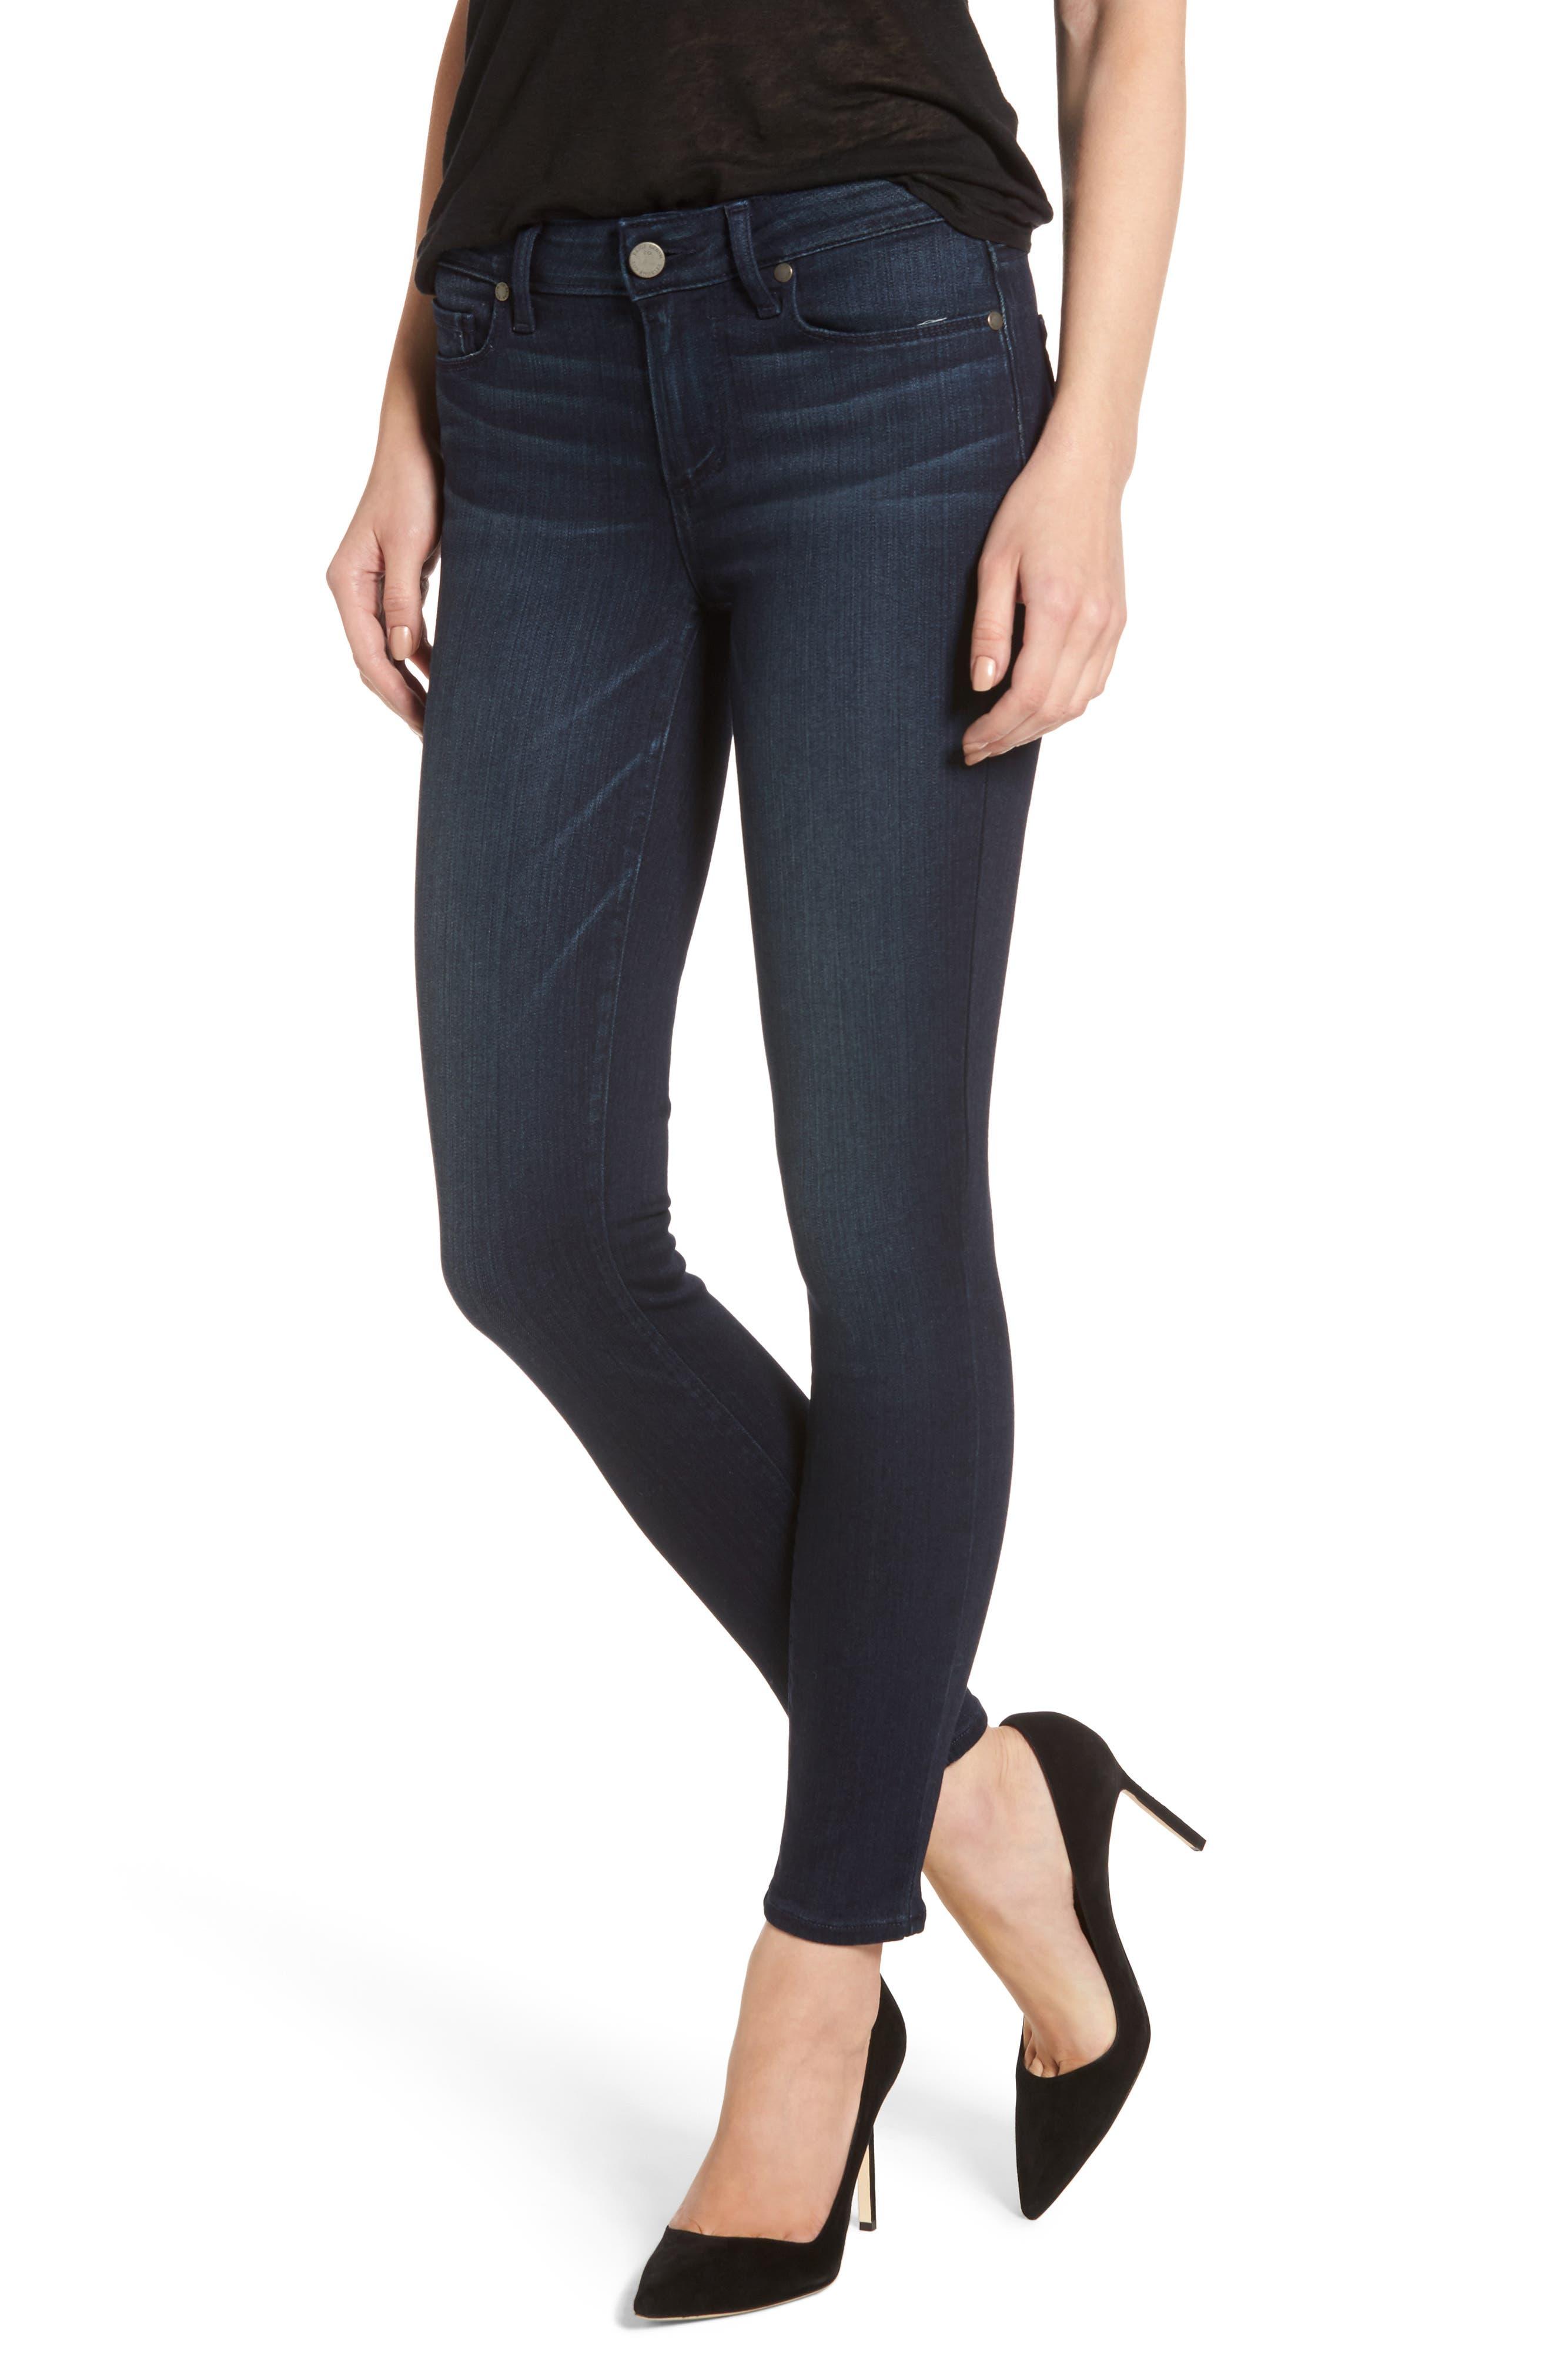 PAIGE Transcend - Verdugo Ankle Skinny Jeans (Midlake)